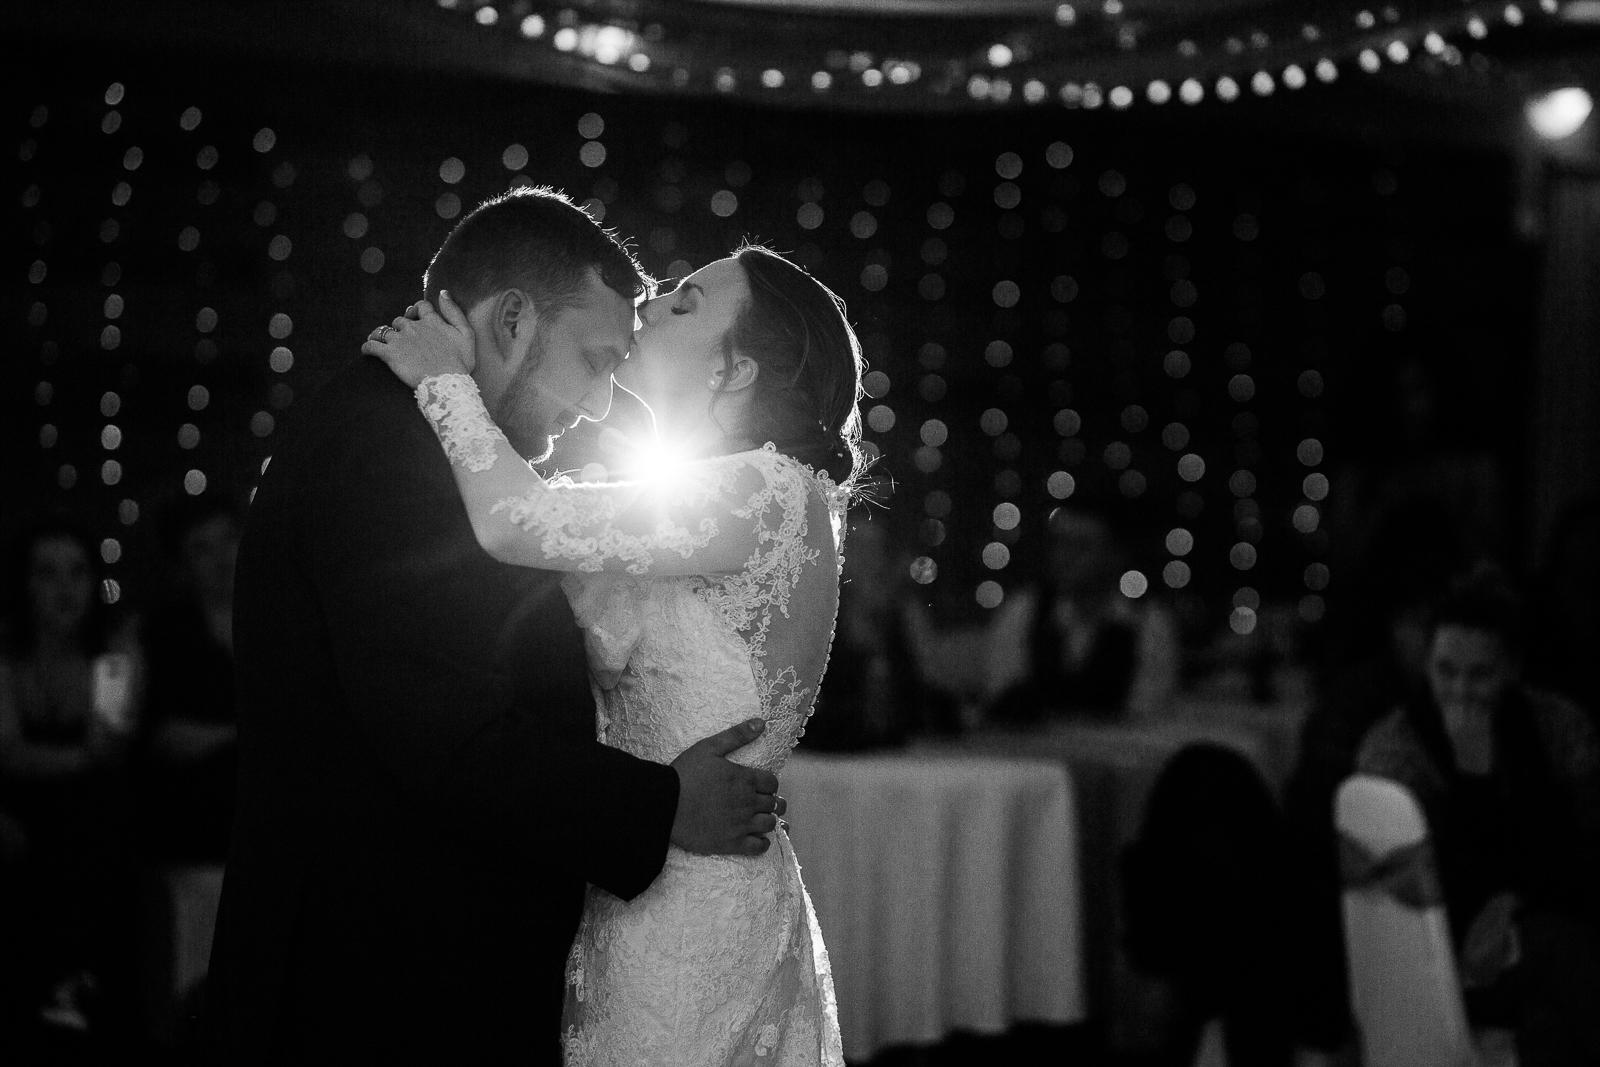 gander-wedding-photographer-144.jpg